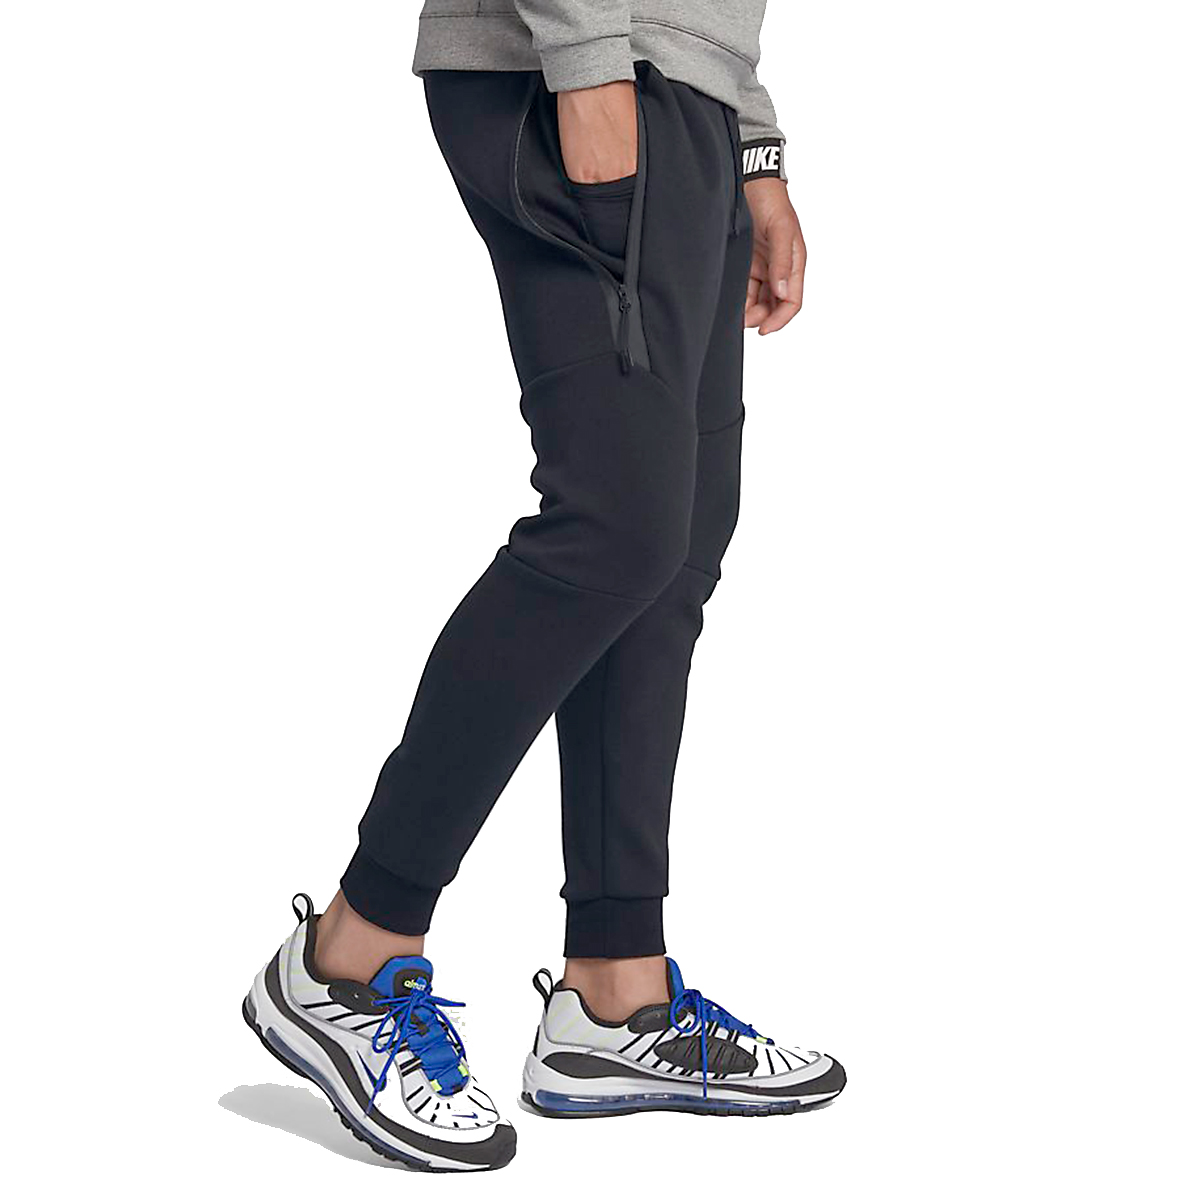 Men's Nike Tech Fleece Jogger - Color: Black - Size: L, Black, large, image 2